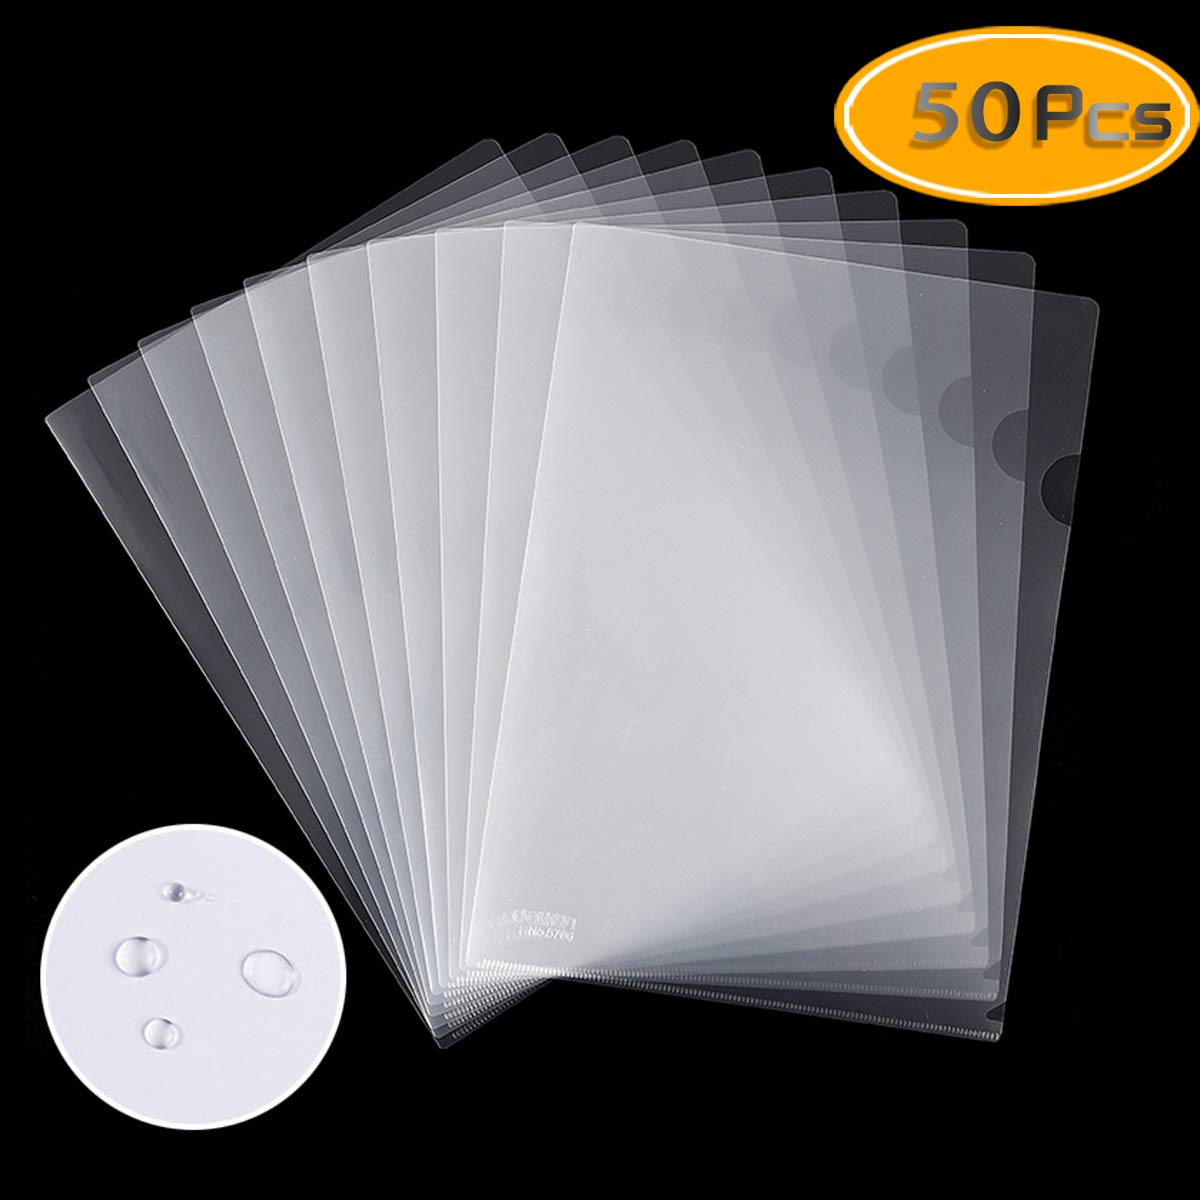 Fyess 50PCS Clear Plastic Document Folders, US Letter/ A4 Size 14C (1.4mm) Thick Clear Transparent Document Folders Copy Safe Project Pockets Lightweight Plastic Paper Jacket Sleeve Folders by Fyess